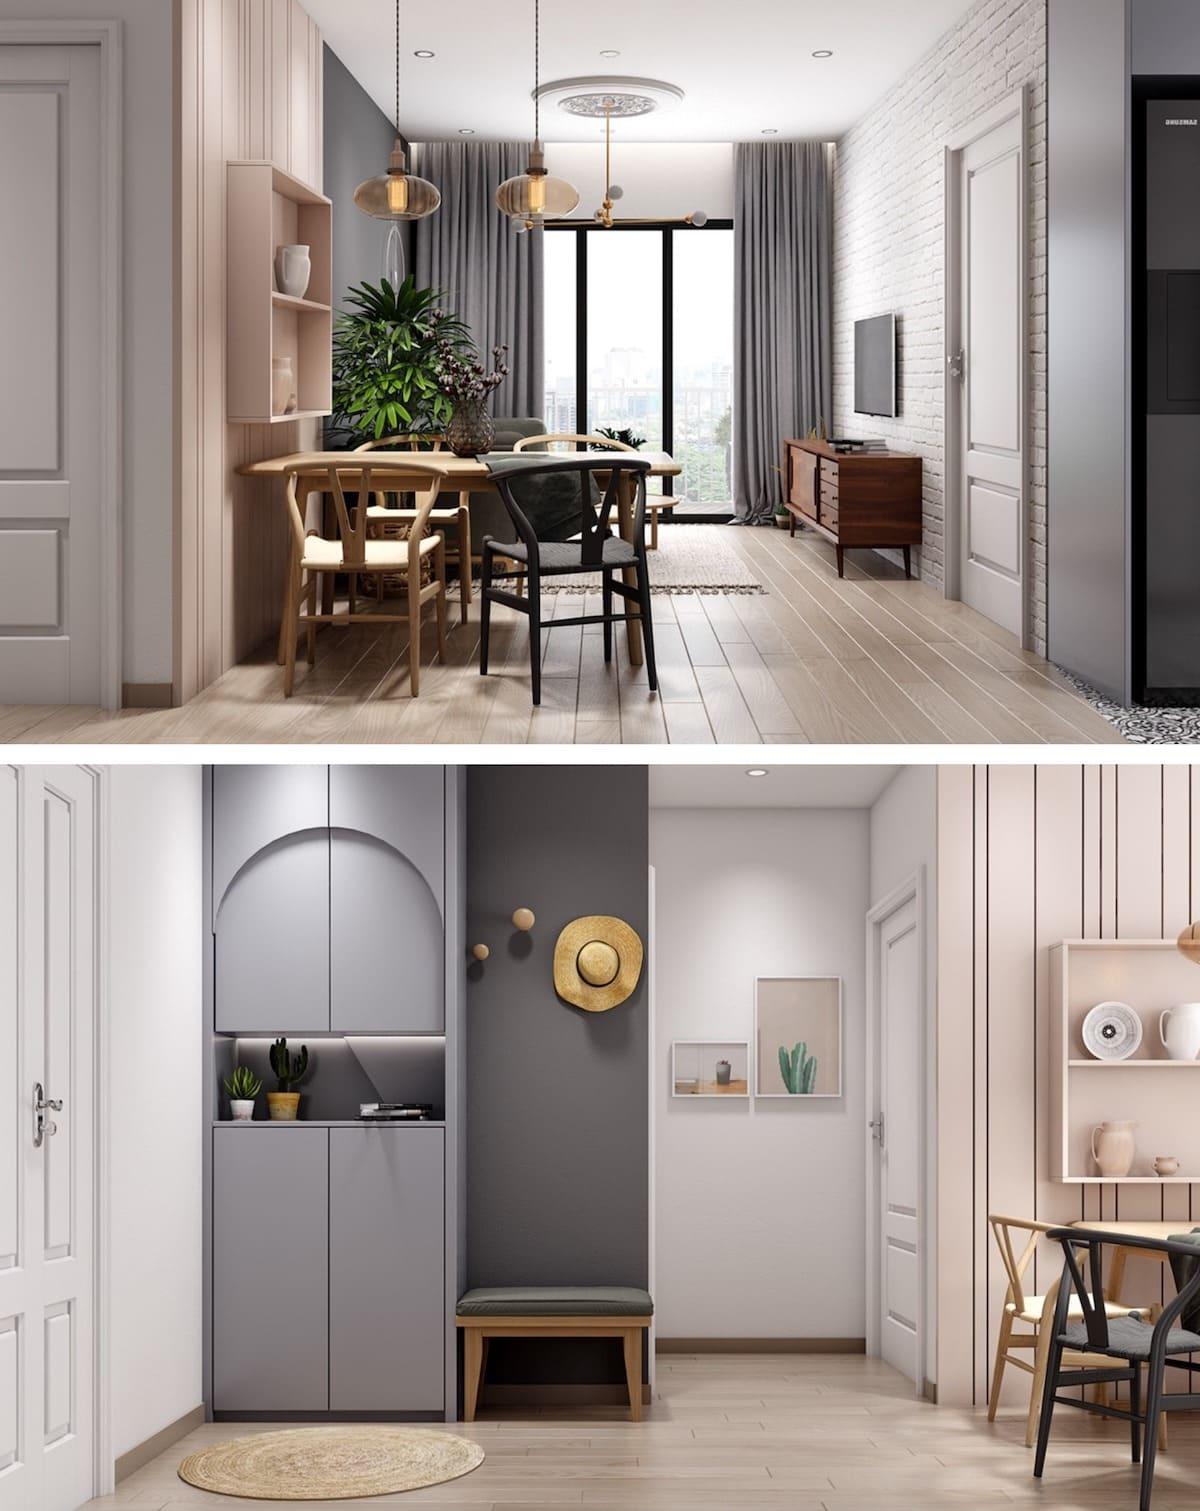 дизайн интерьера модной квартиры фото 71